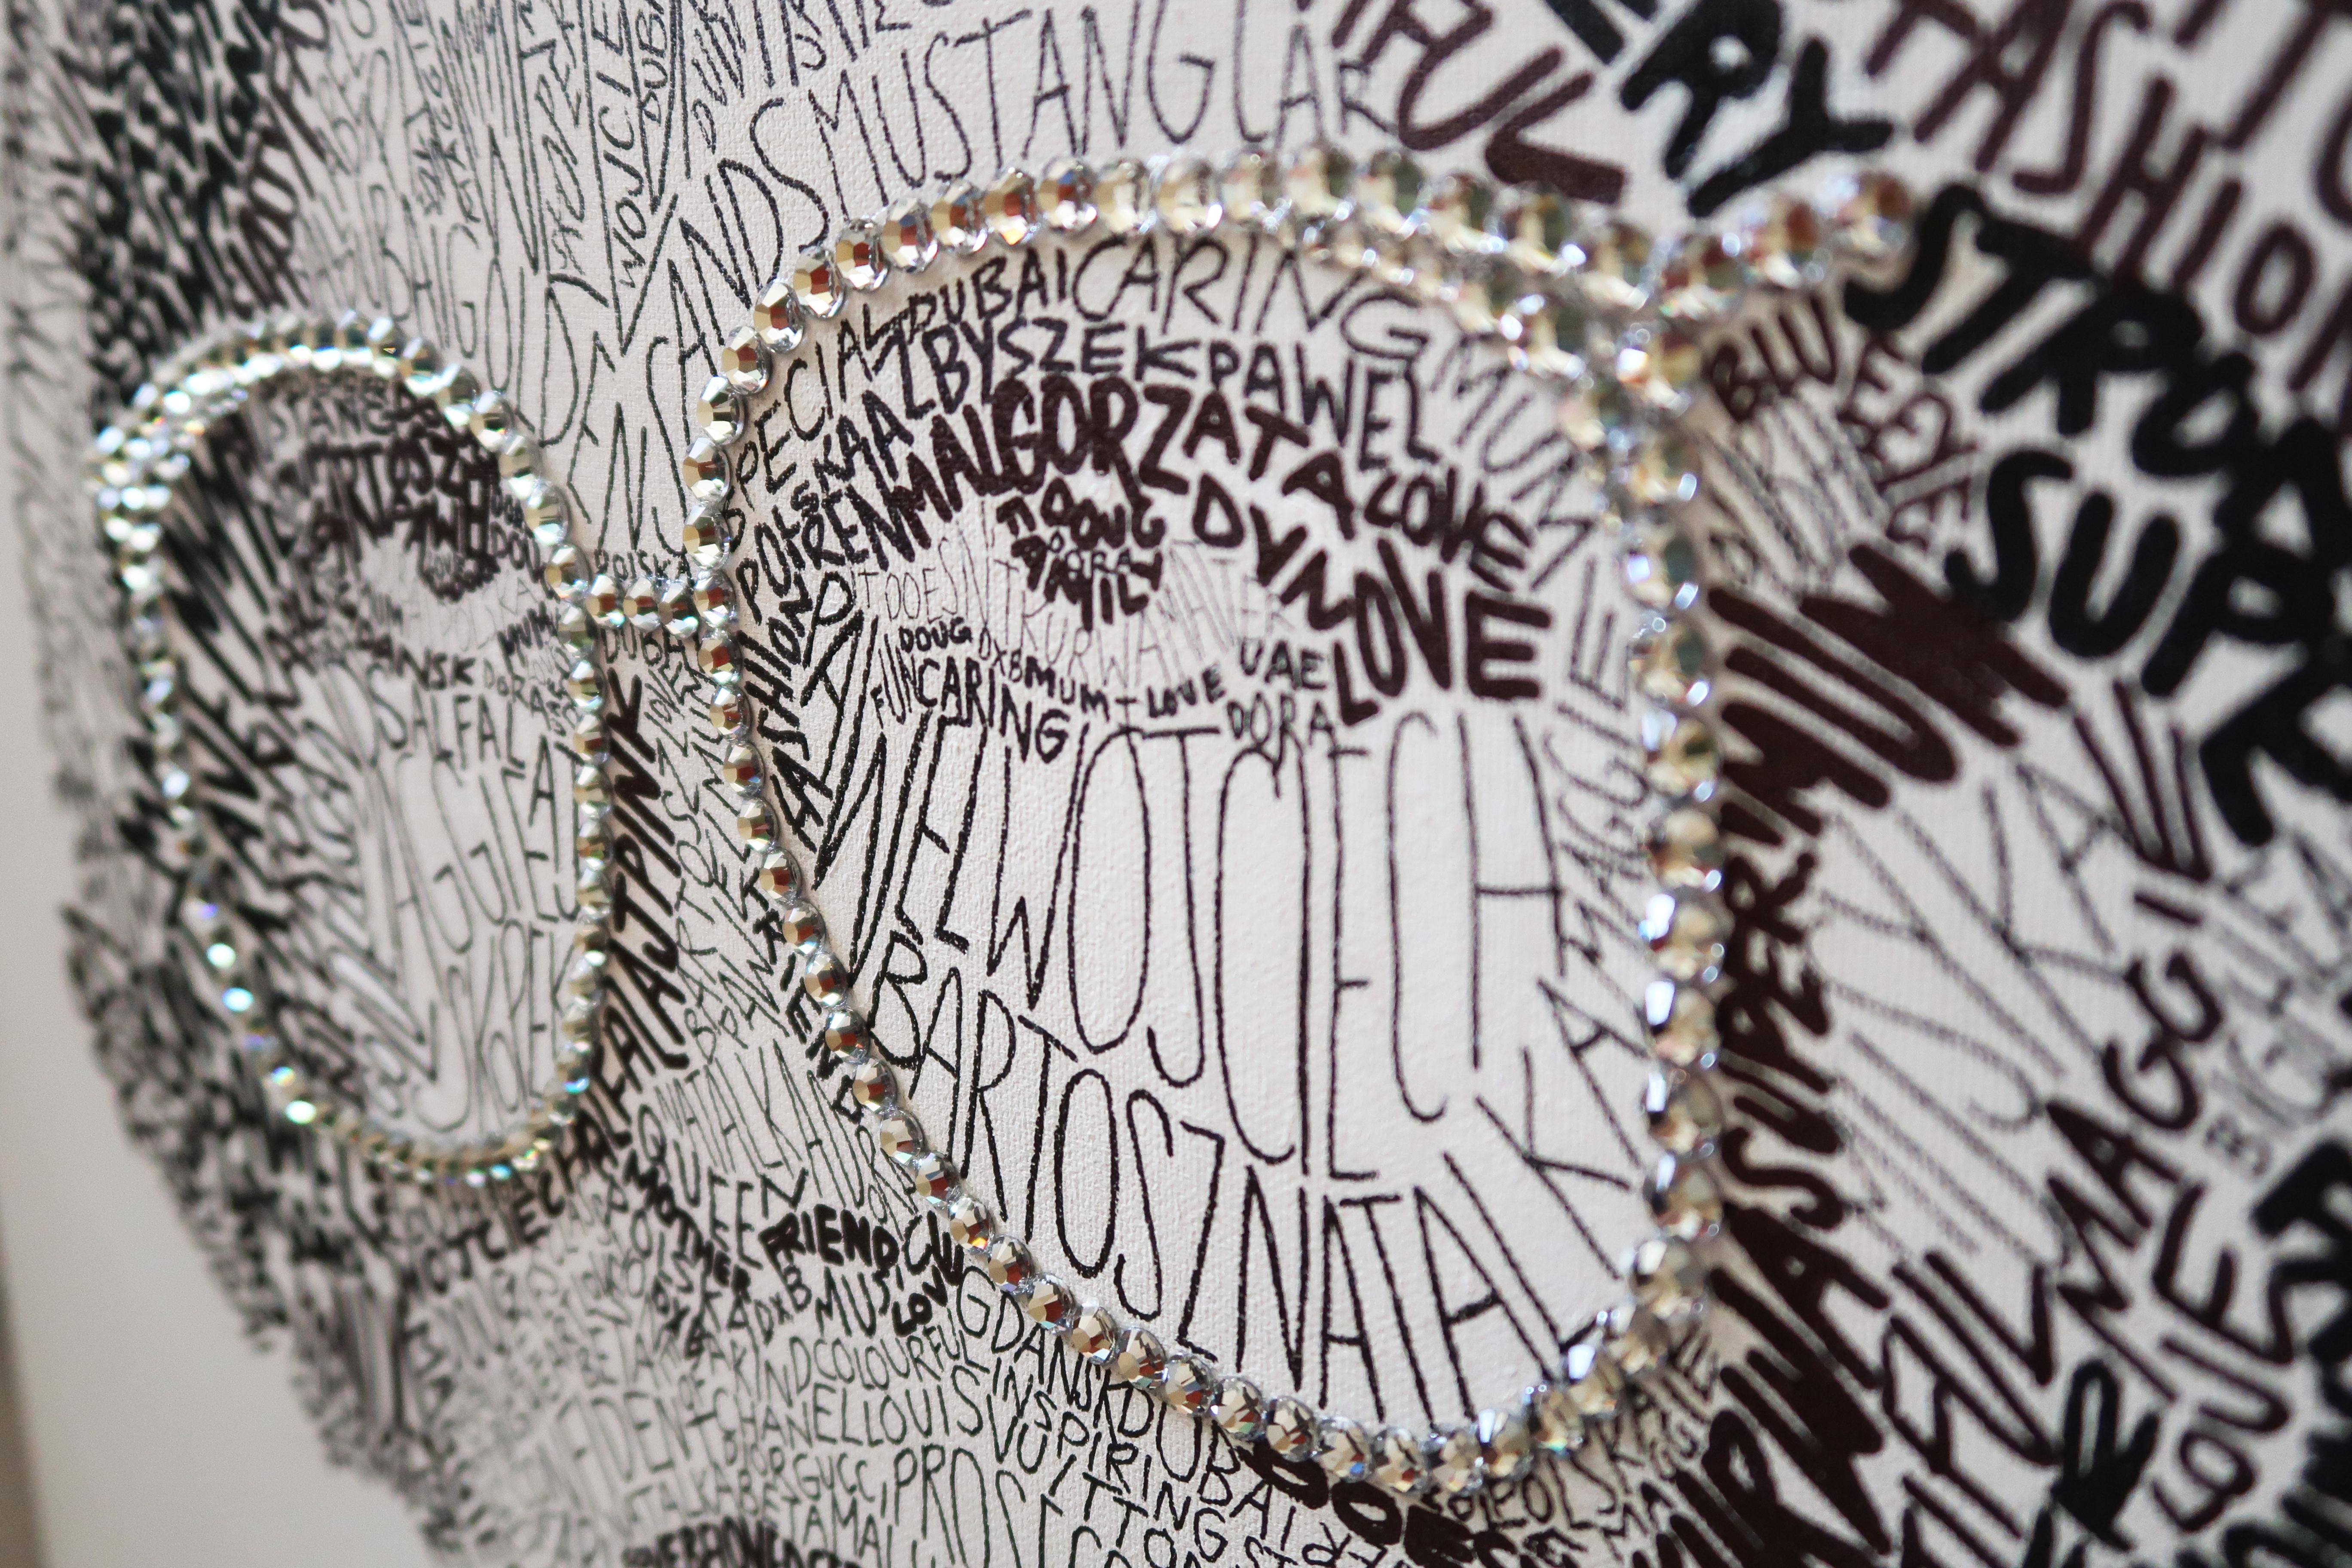 Maggie Word Art Story of Maggie Natalie